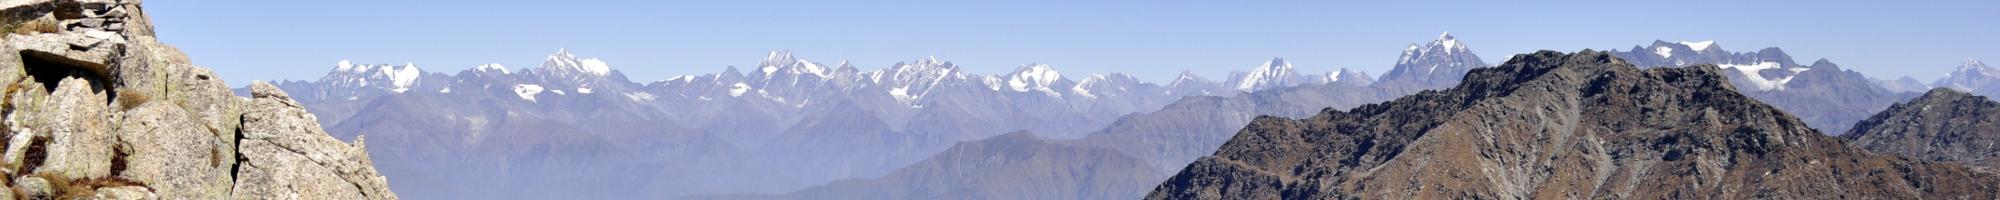 https://www.intakt-reisen.de/wp-content/themes/intakt-reisen-de/img/slideshow/Dharamshala im Himalaya